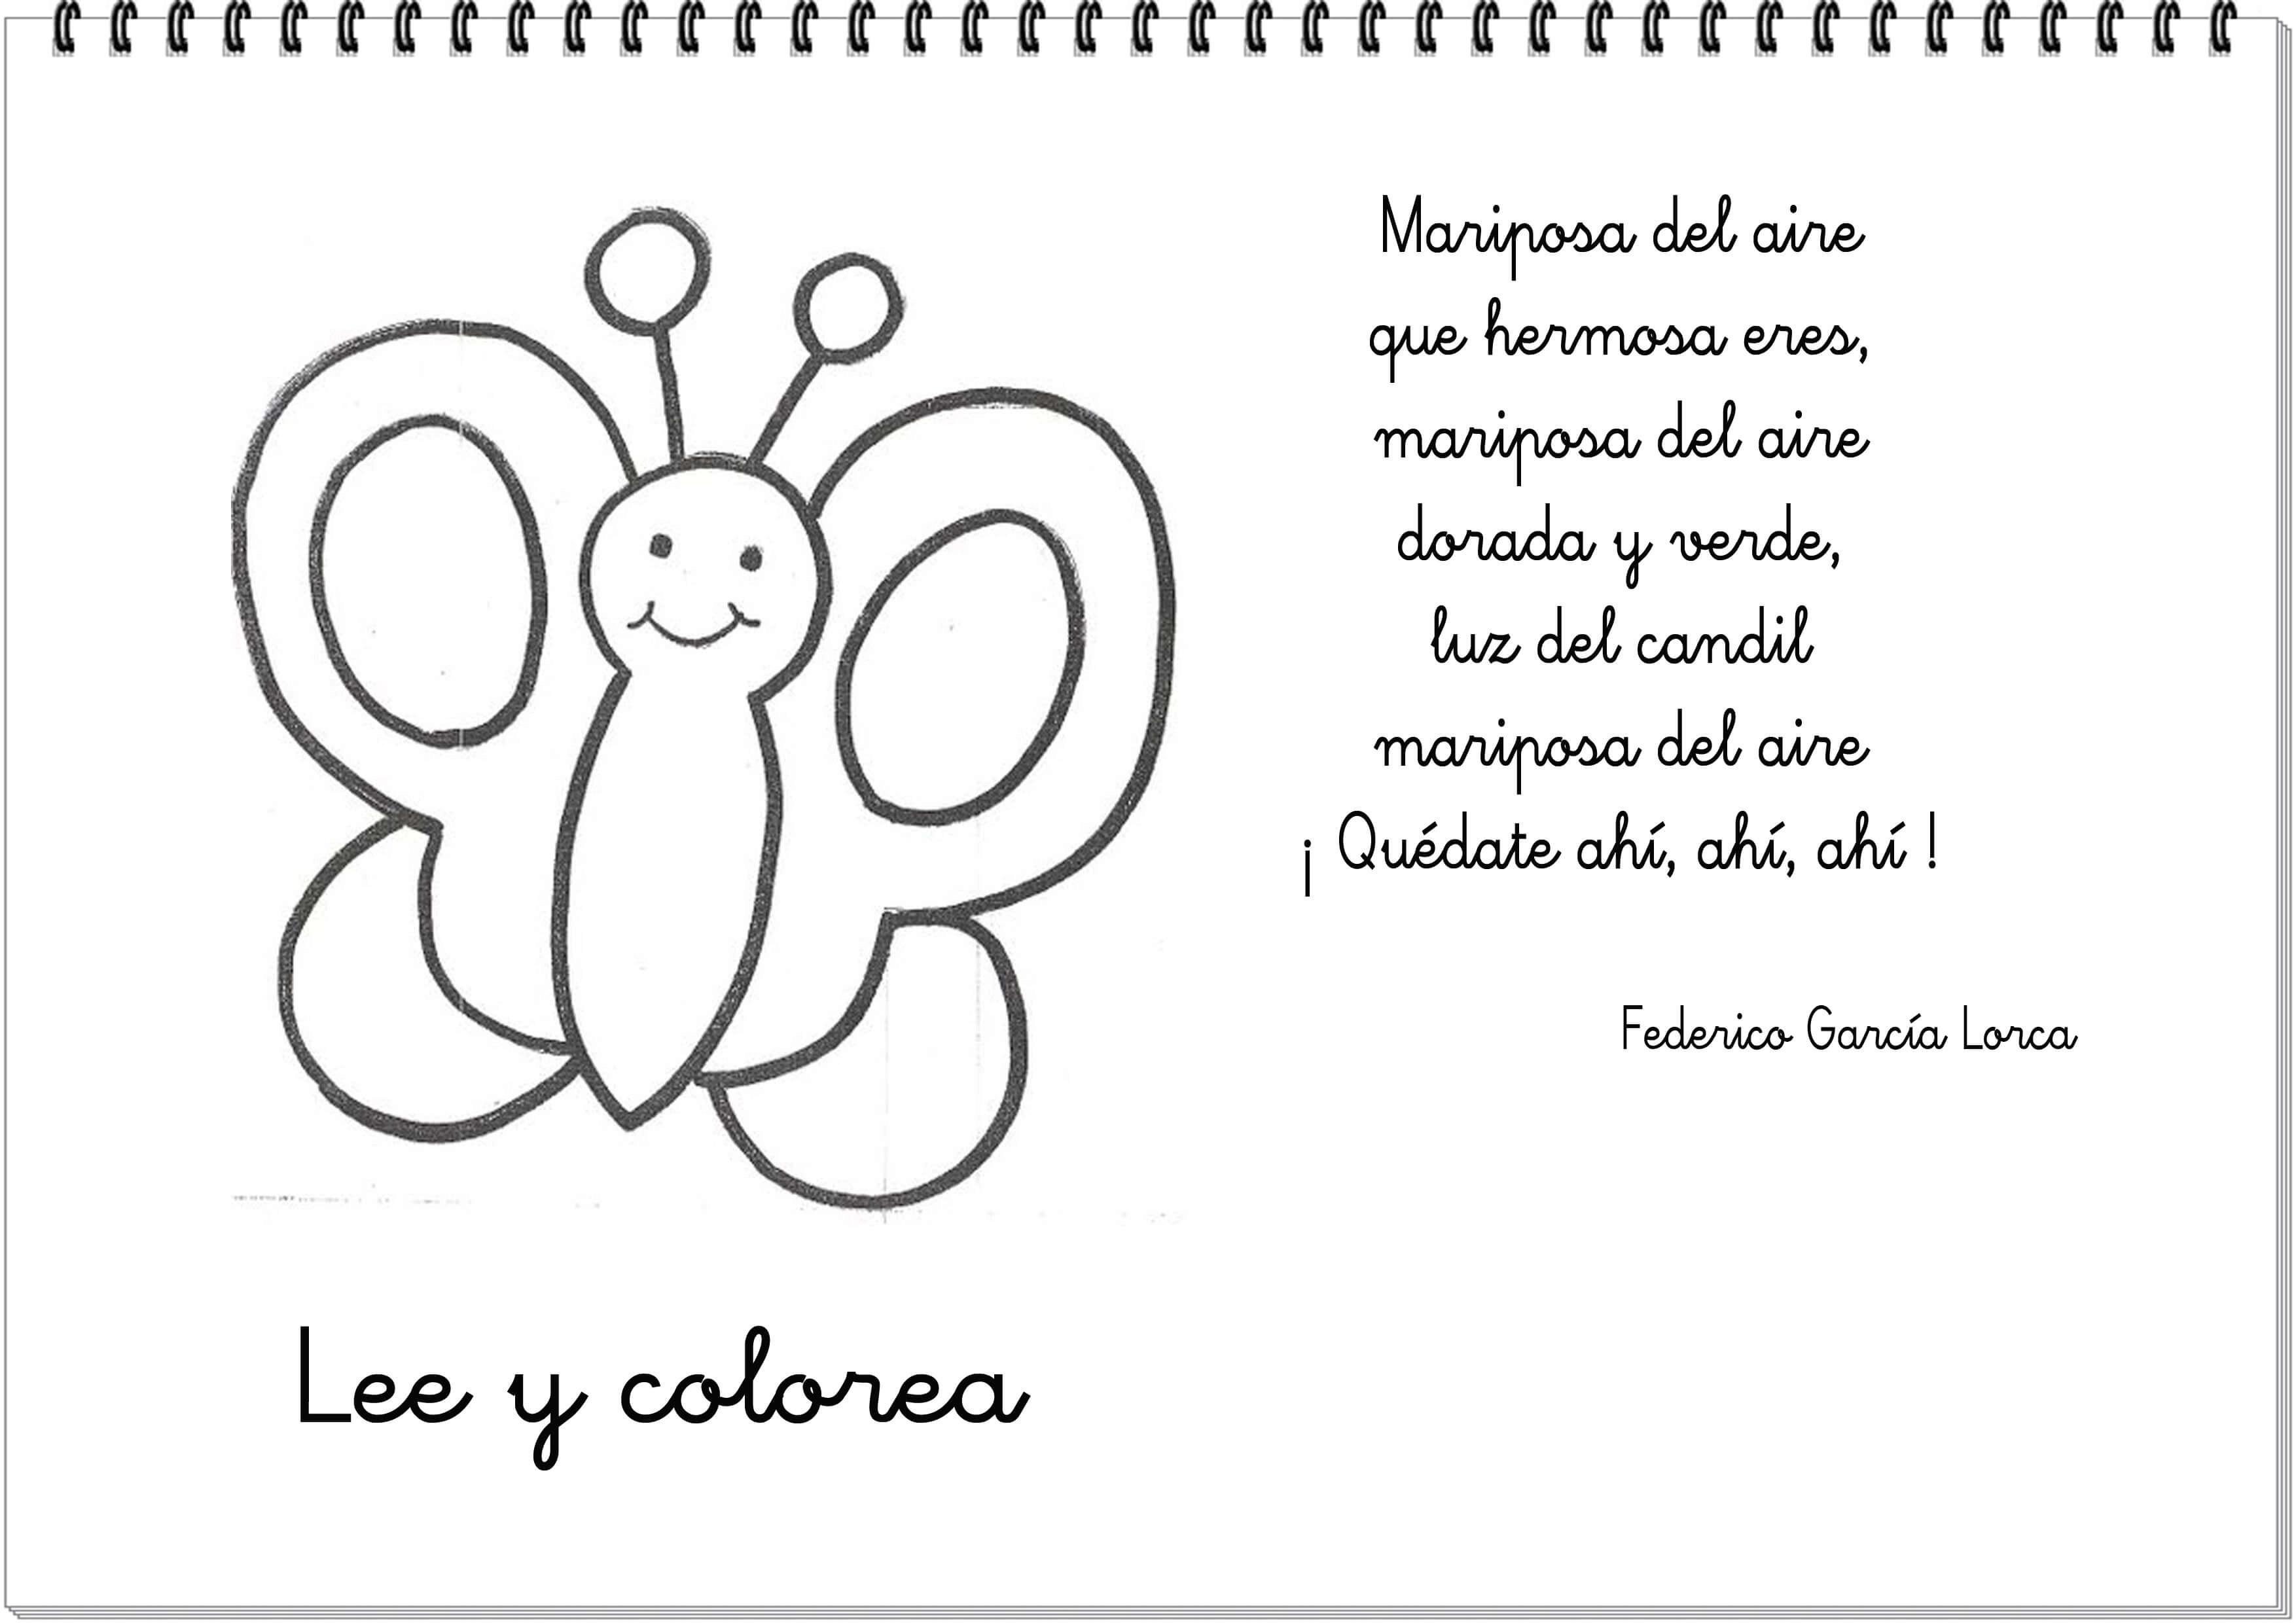 http://i2.wp.com/www.educapeques.com/wp-content/uploads/2014/03/Poema-de-primavera-3.jpg